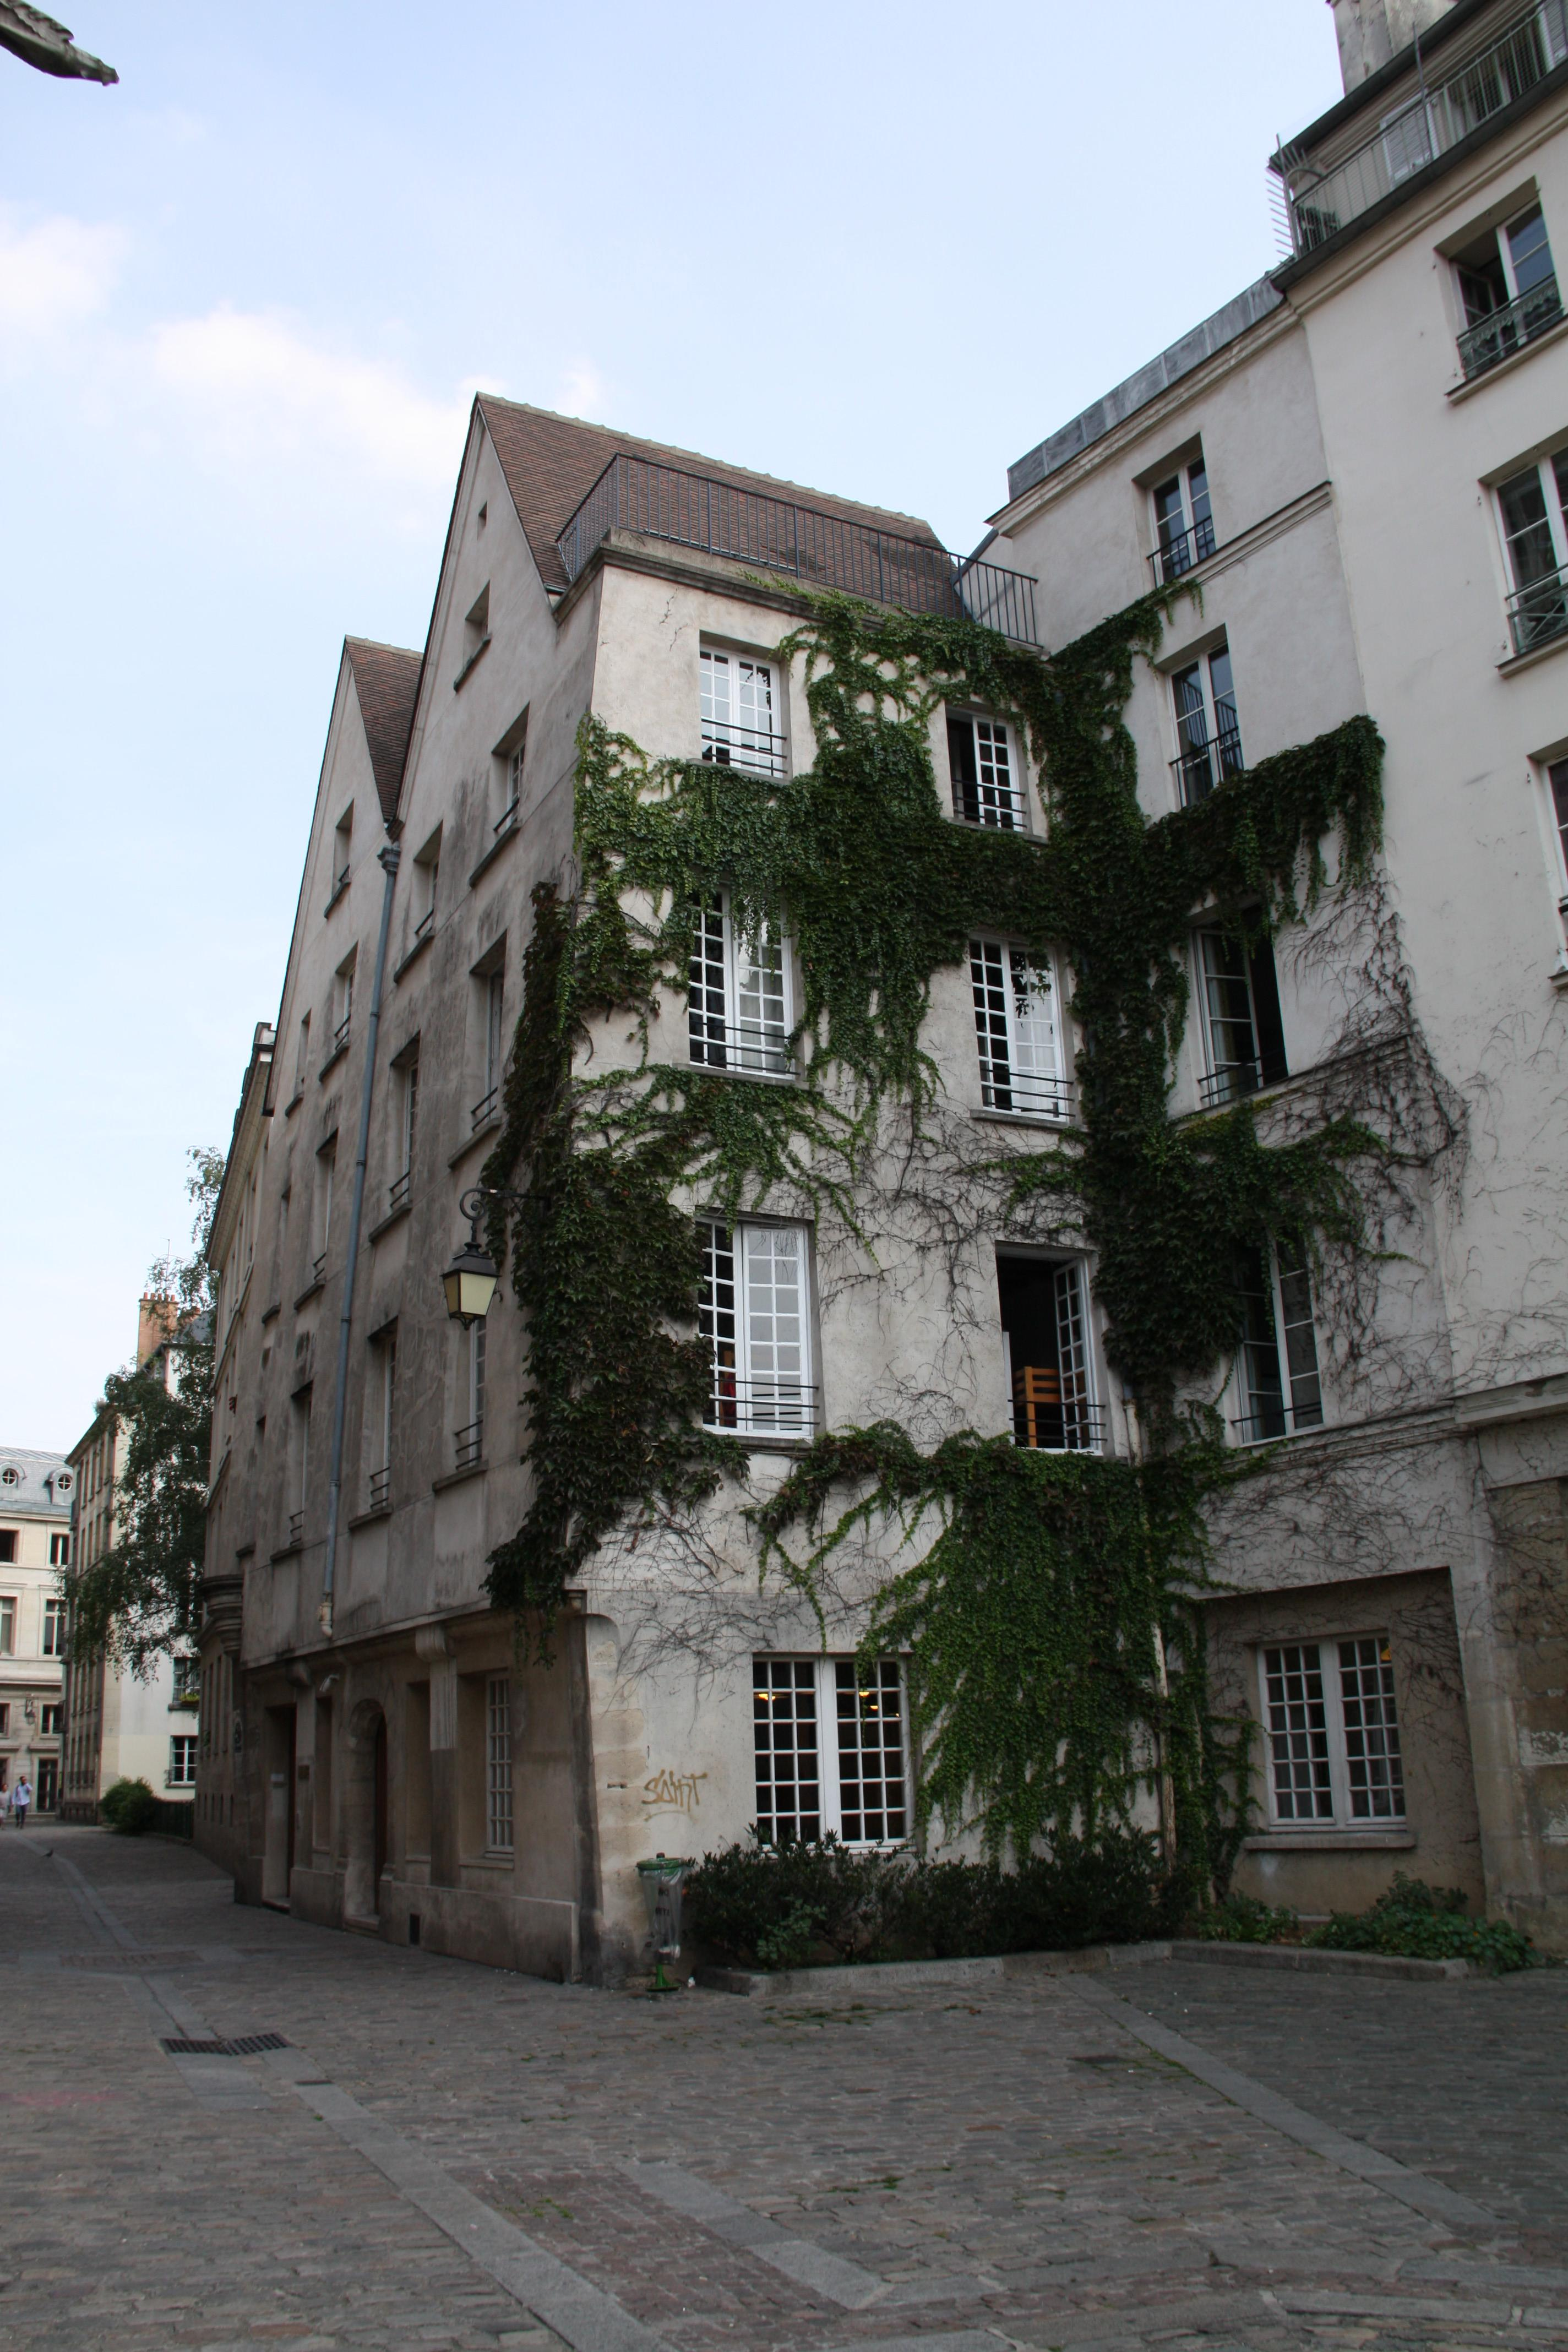 Hostel Mije Maubuisson